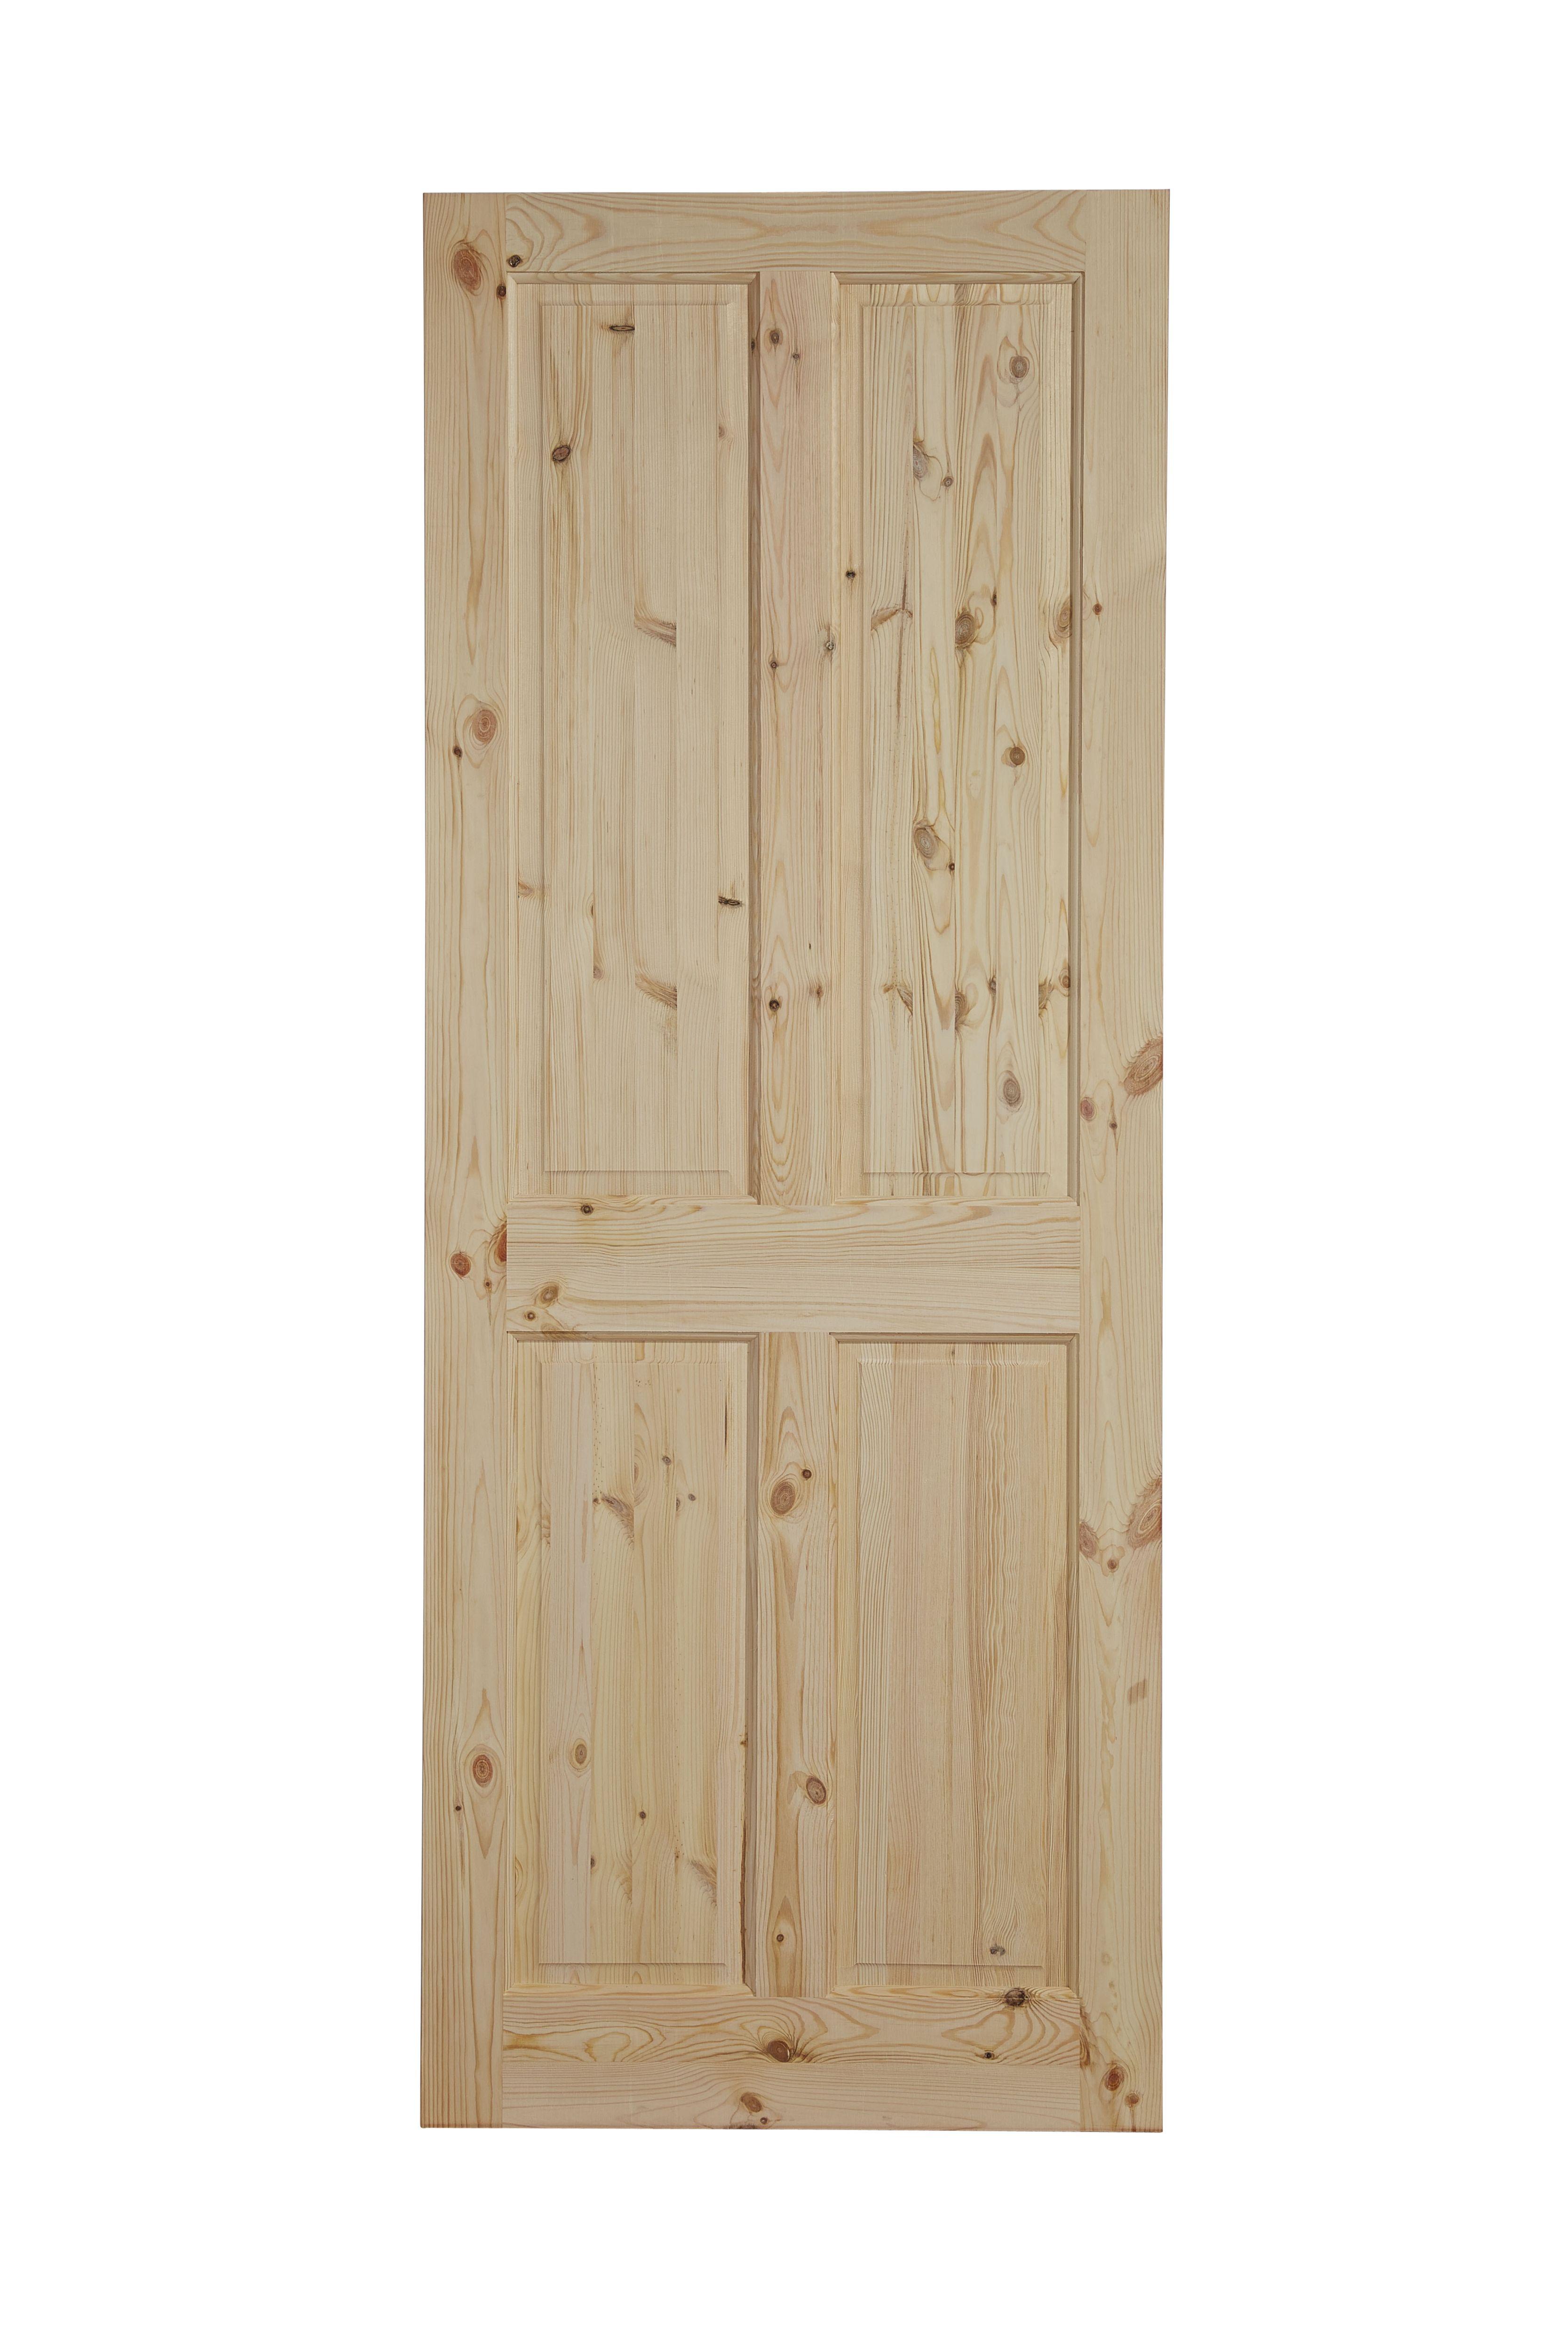 4 Panel Knotty Pine Unglazed Internal Standard Door